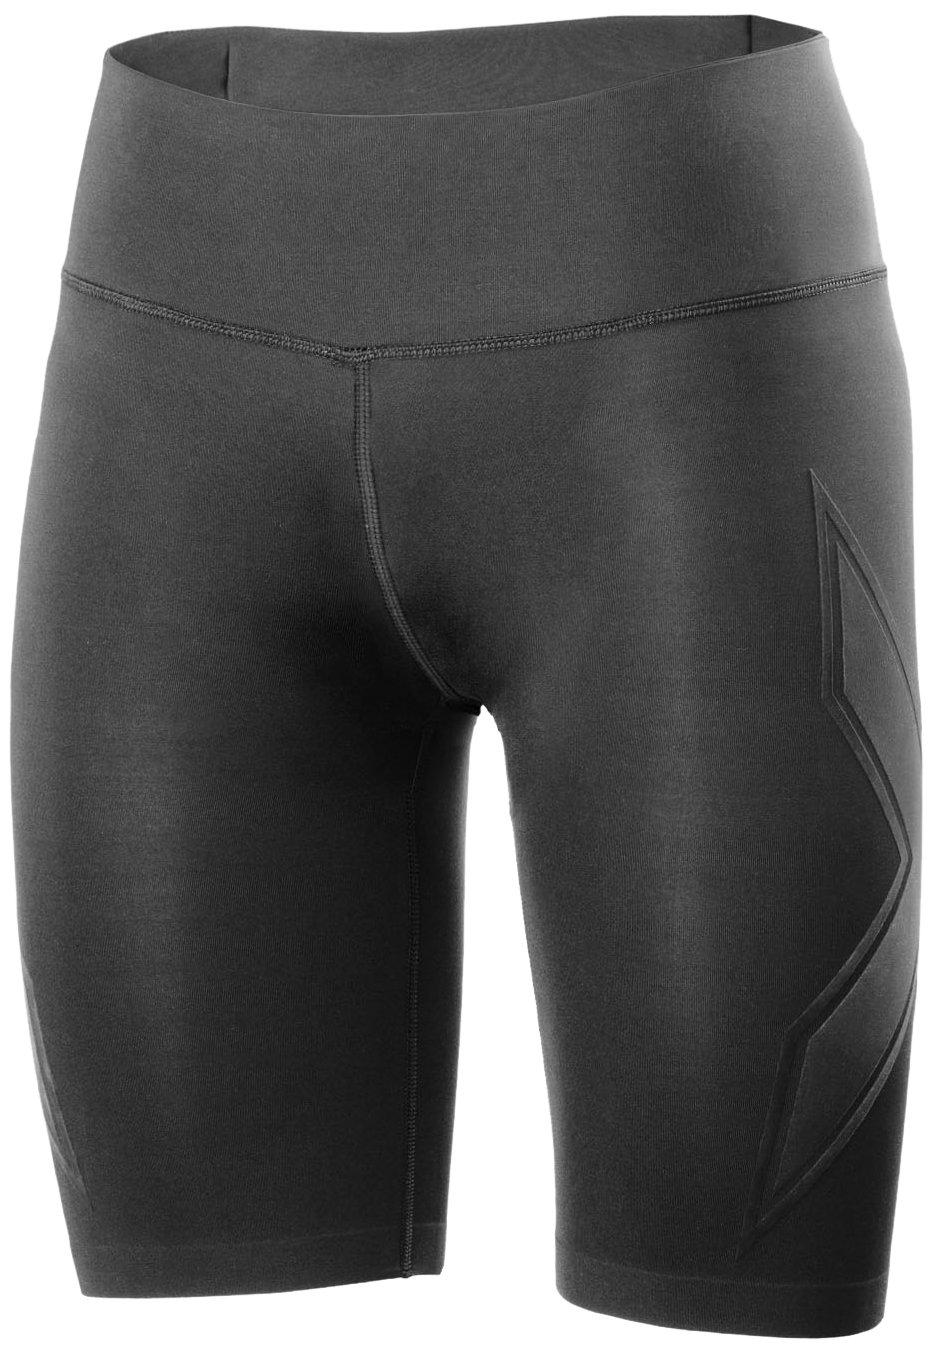 2XU Women's XTRM Compression Shorts, Large, Black/Black